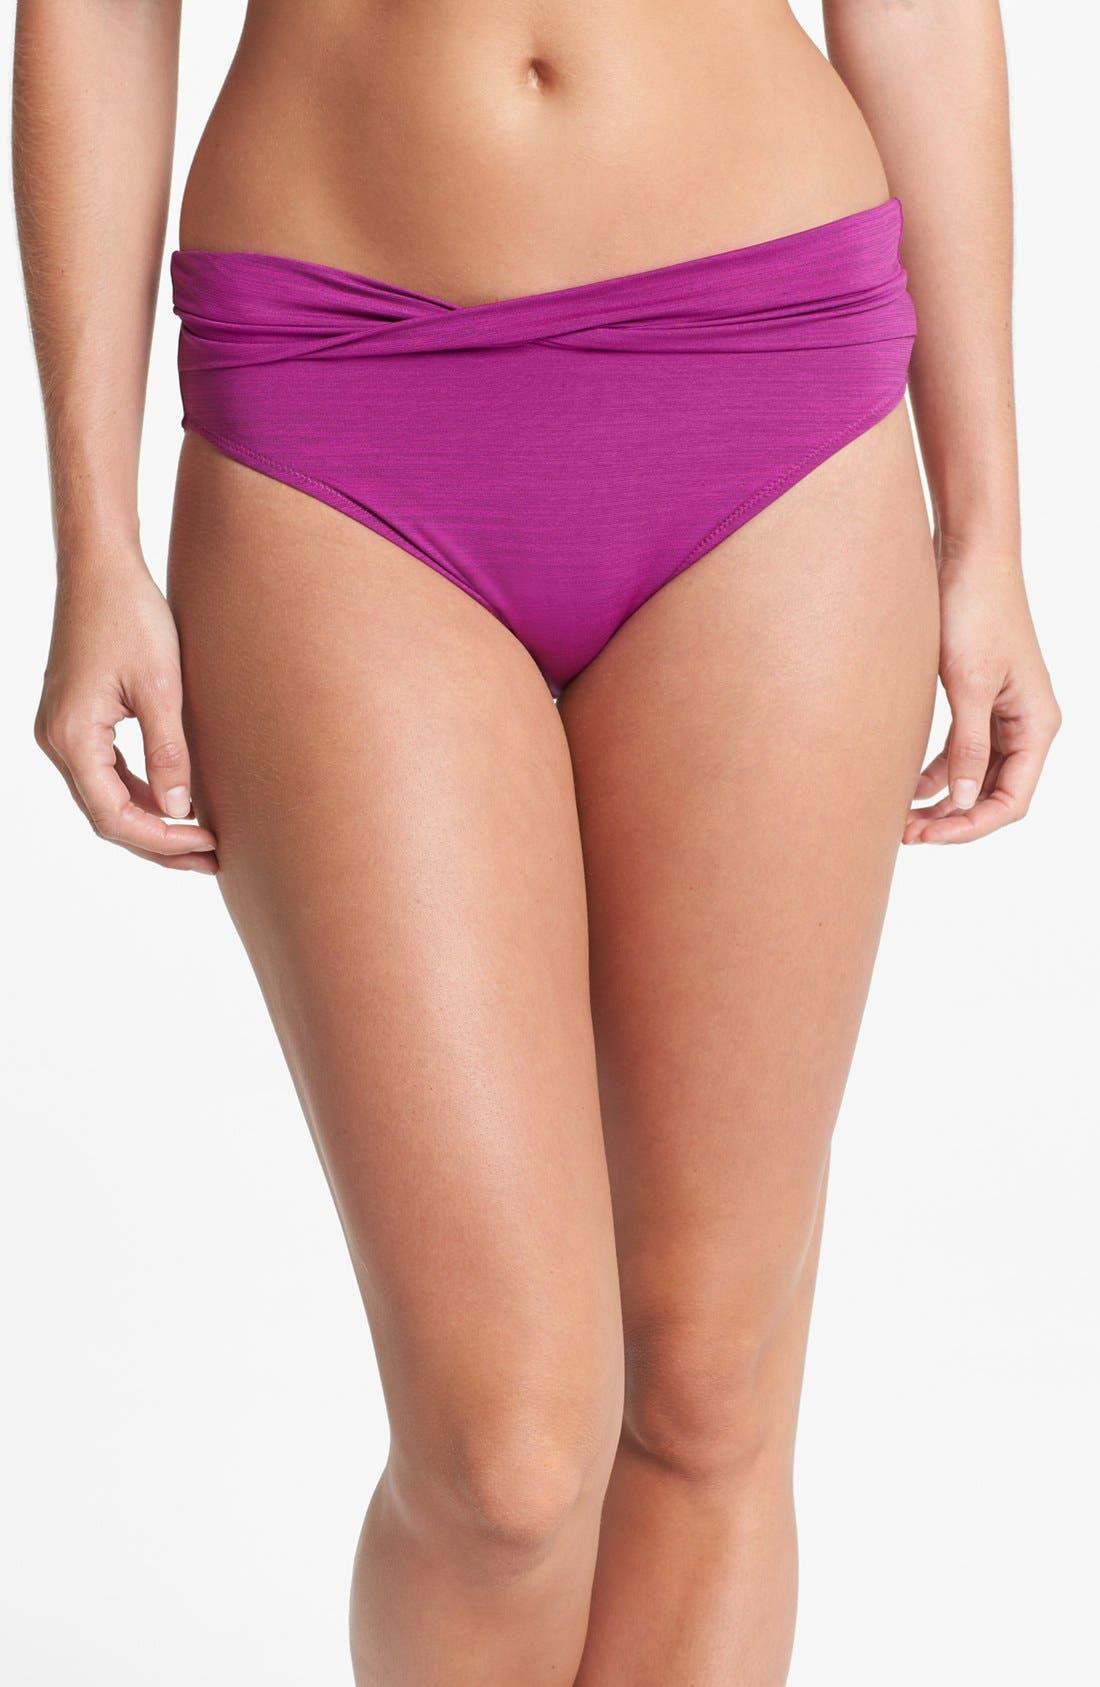 Alternate Image 1 Selected - Fantasie 'Classic Twist' Bikini Bottoms